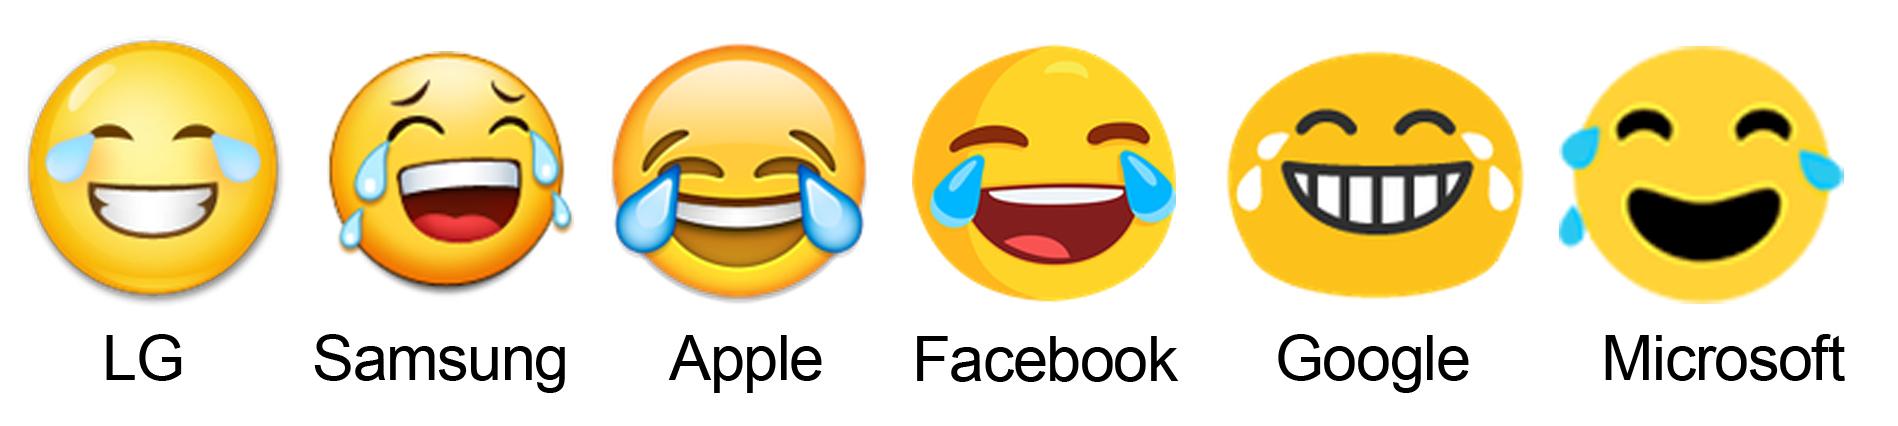 1898x426 5 Emojis You'Re Using Wrong